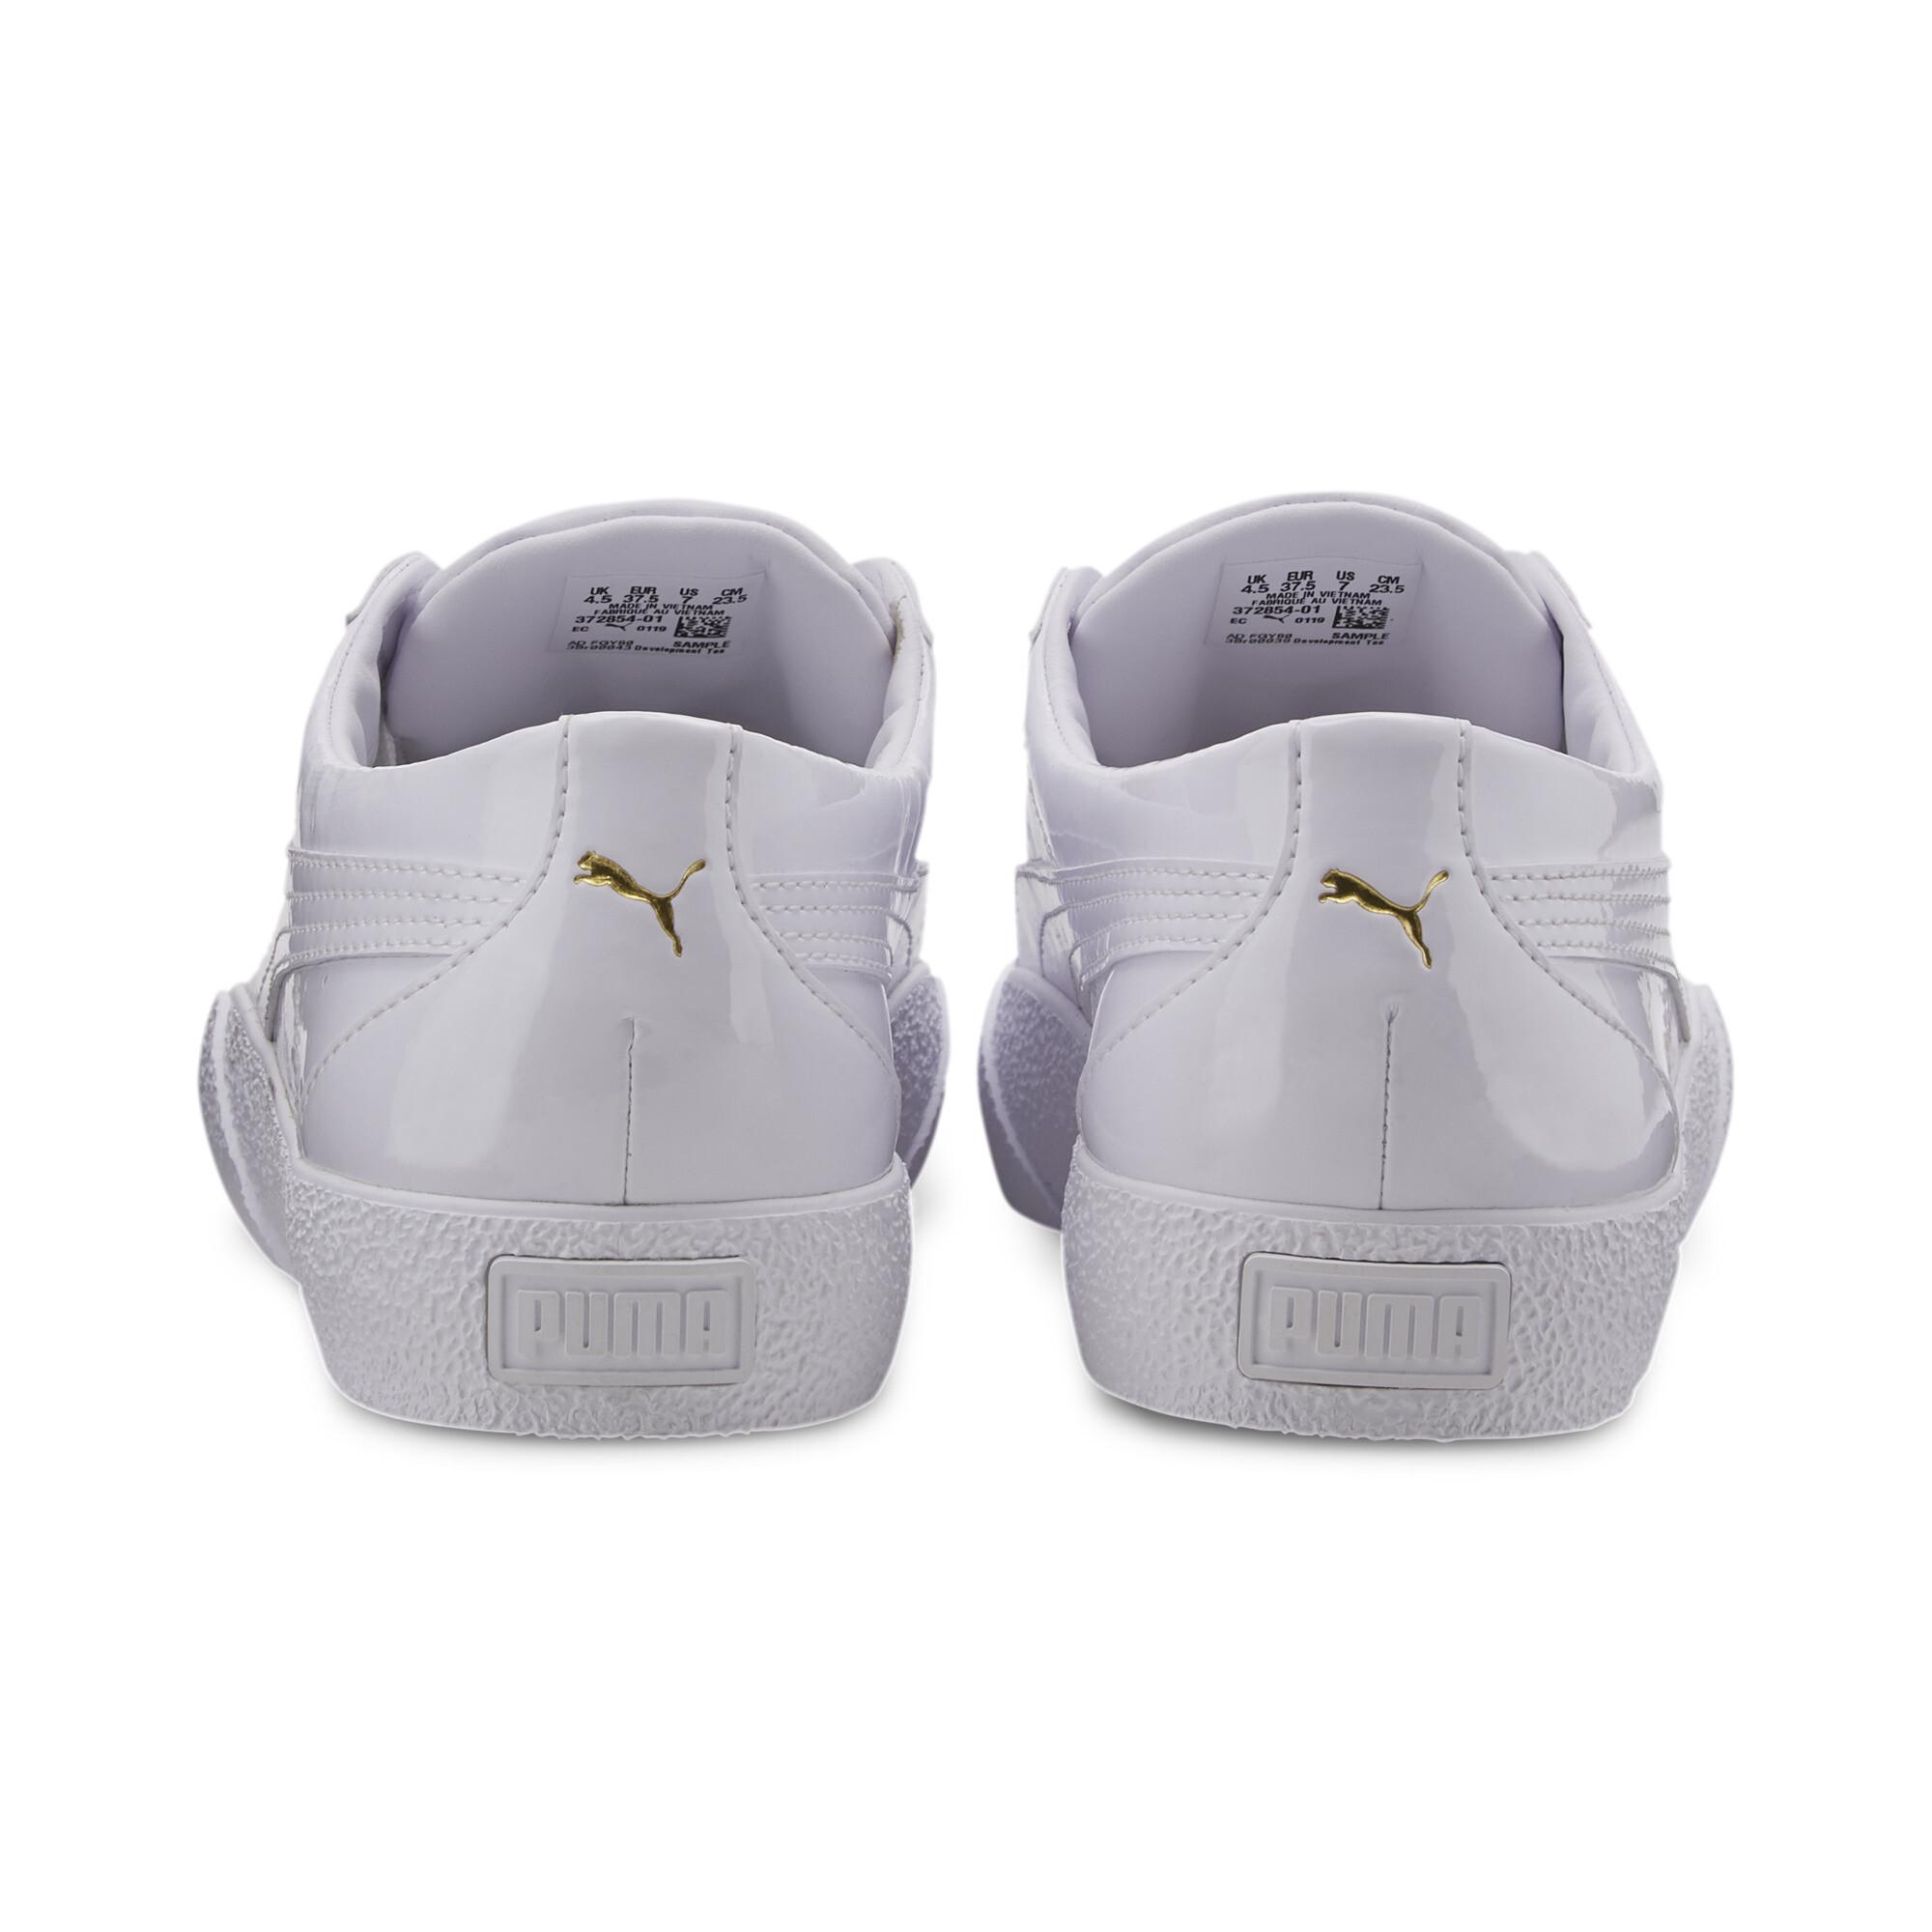 PUMA-Women-039-s-Love-Patent-Sneakers thumbnail 10